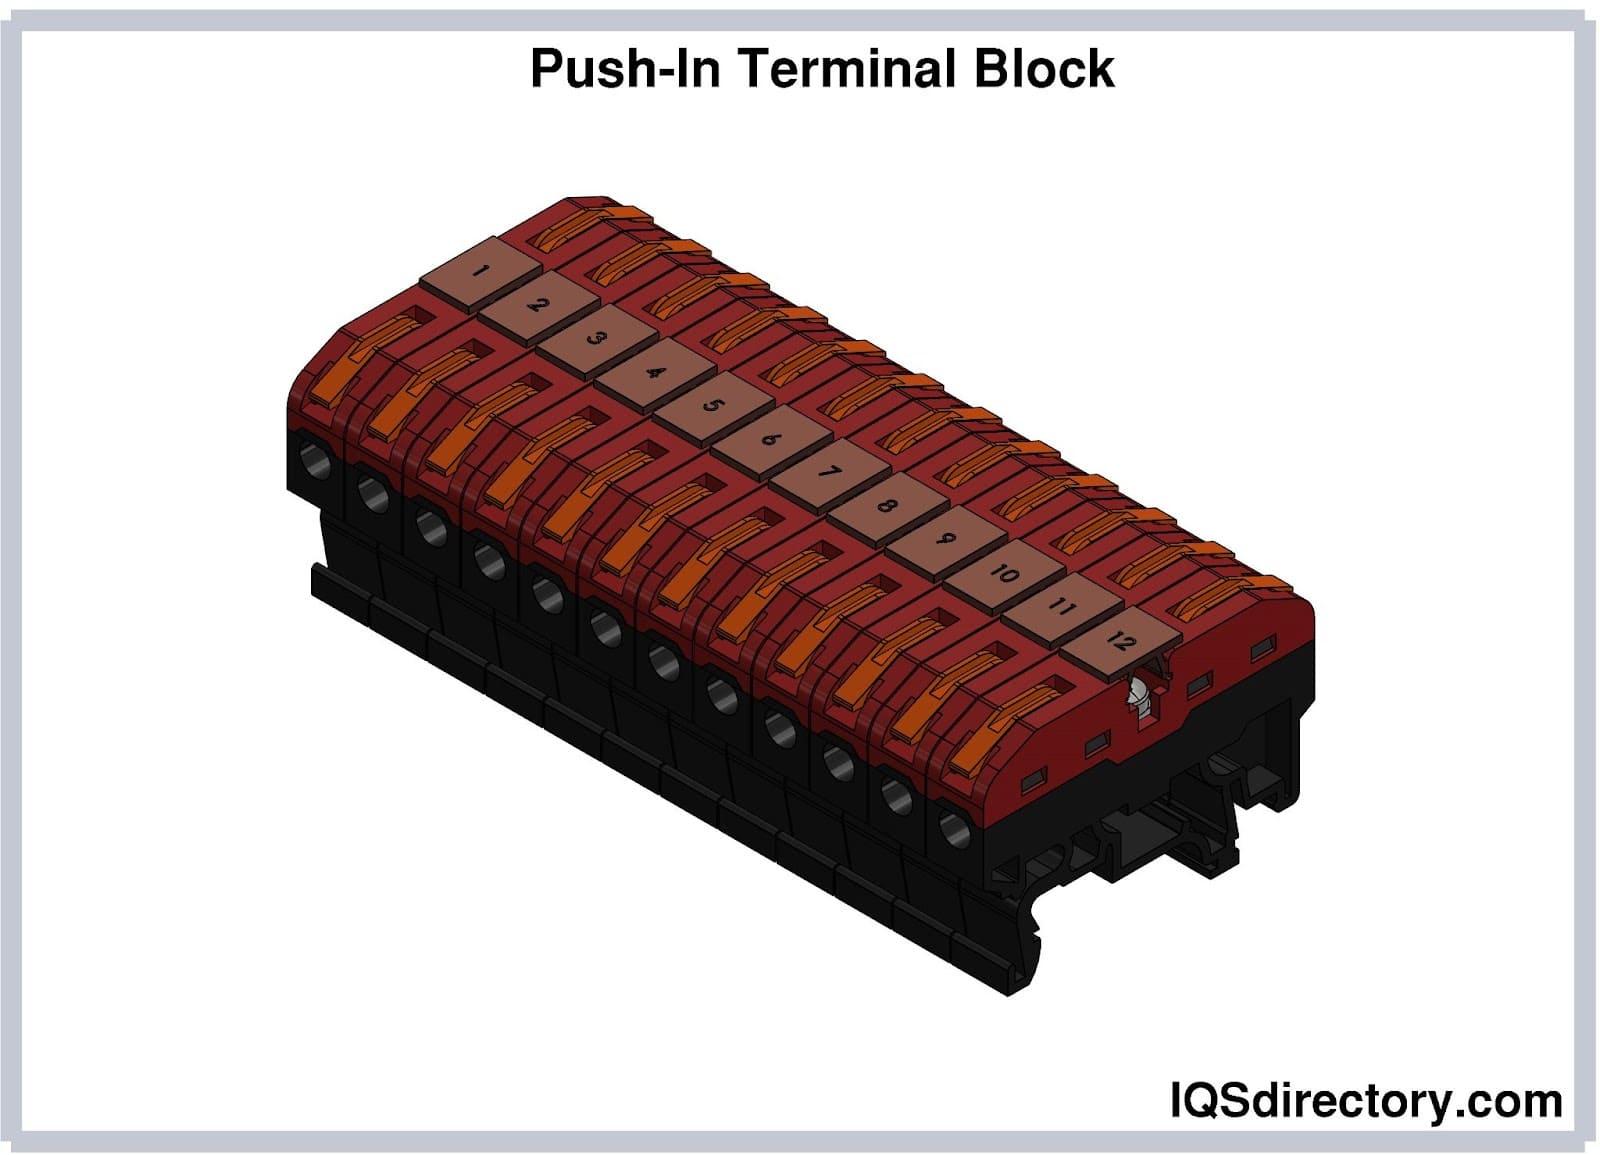 Push-In Terminal Block